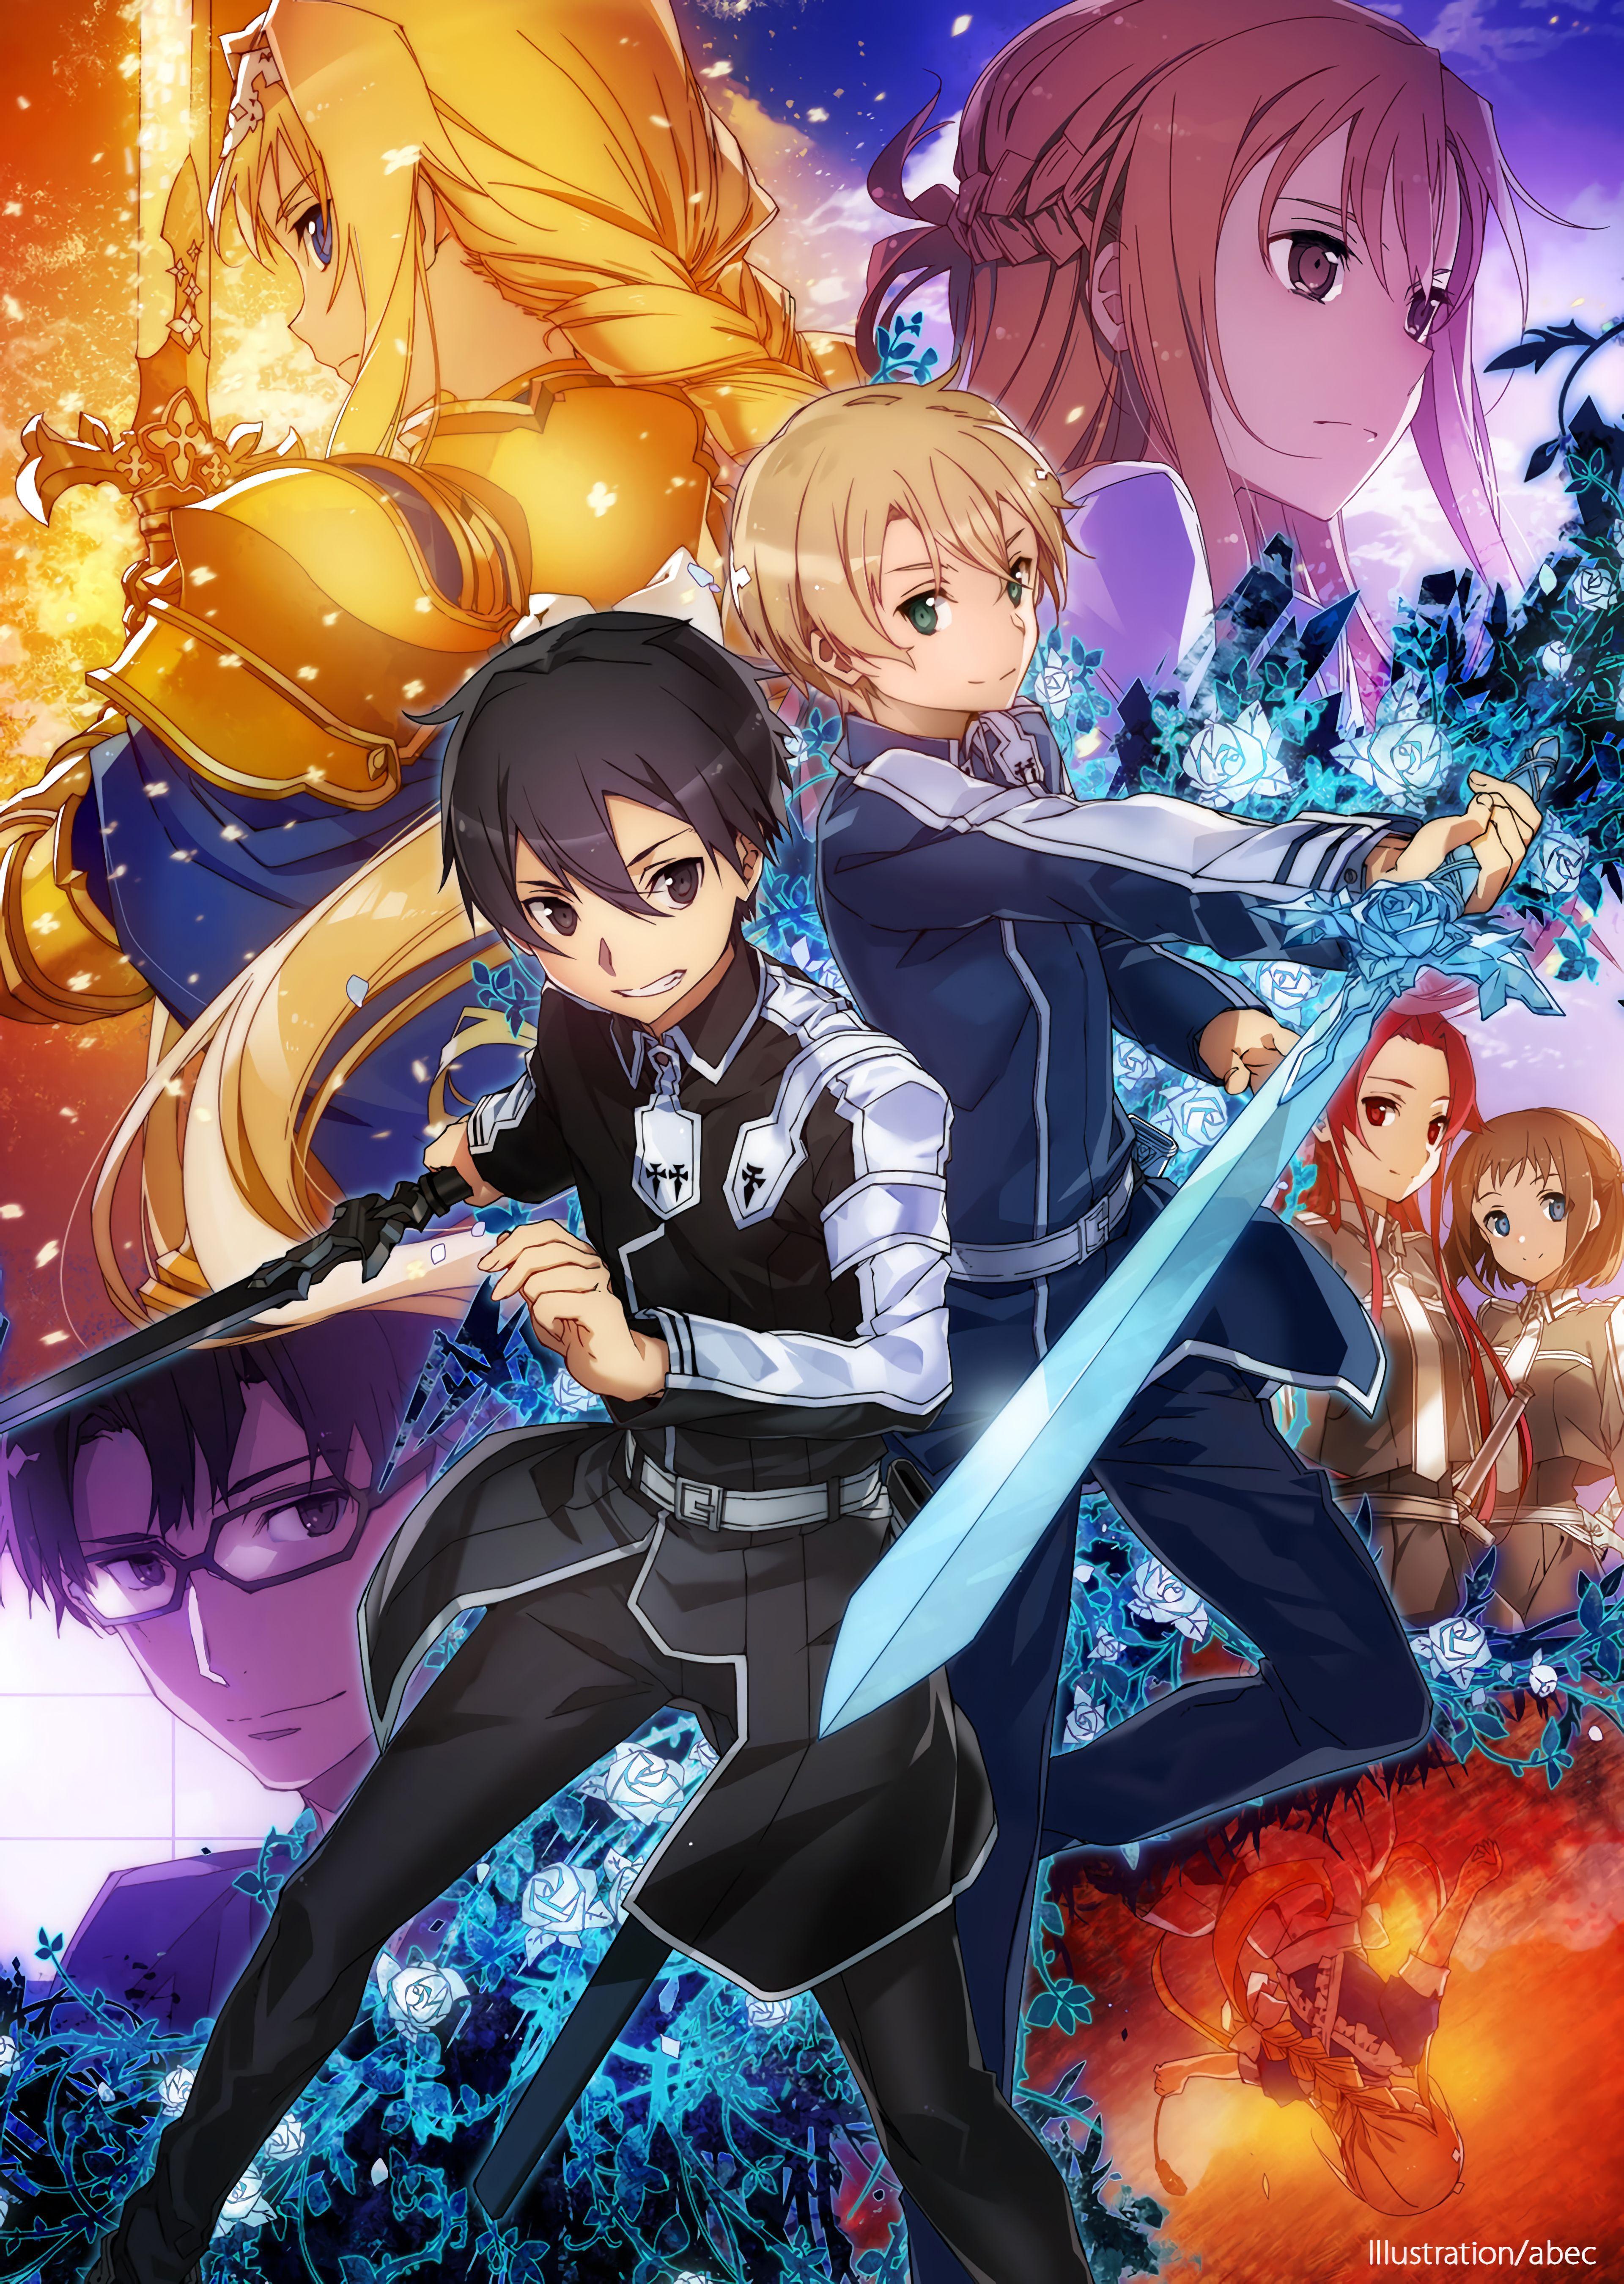 Sword Art Online - Saison 3 Episode 24 Vostfr : sword, online, saison, episode, vostfr, Sword, Online, UnderWorld, Wallpapers, Wallpaper